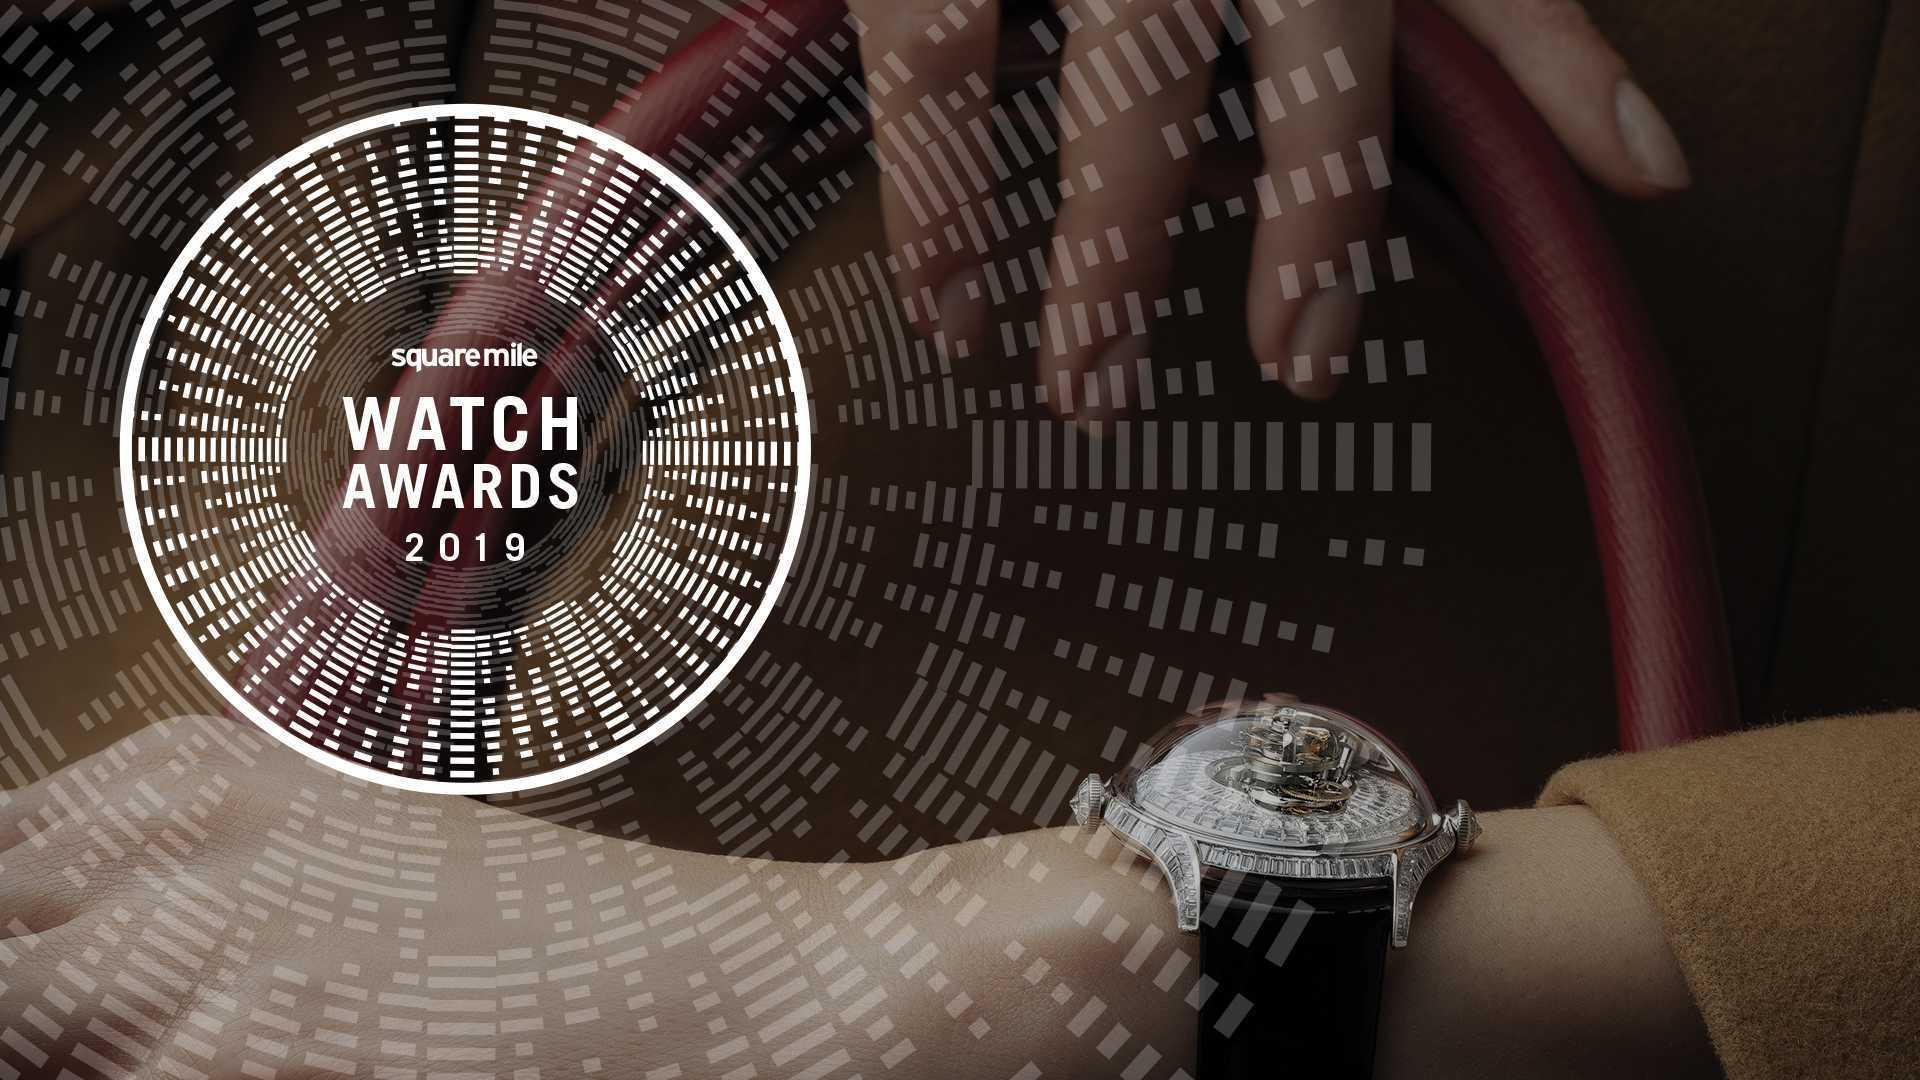 Square Mile Watch Awards 2019: Best Women's Watch shortlist